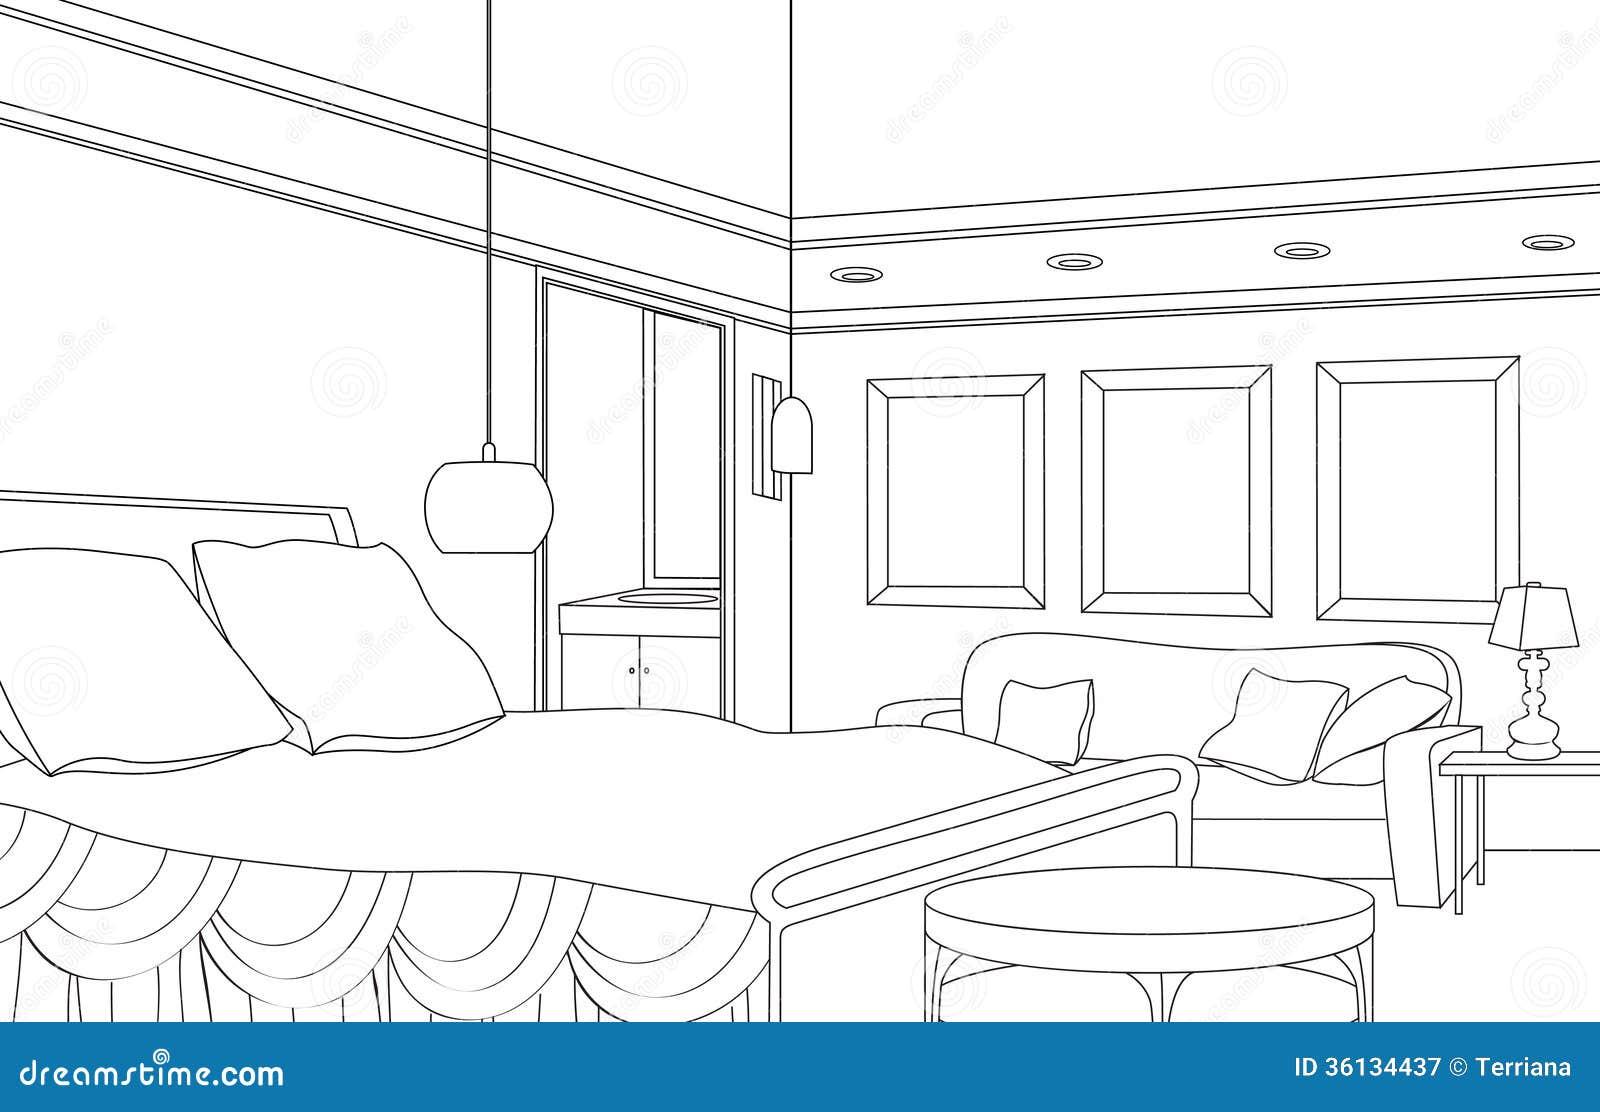 Dormitorio Dibujo ~ Dormitorio en dibujo Imagui